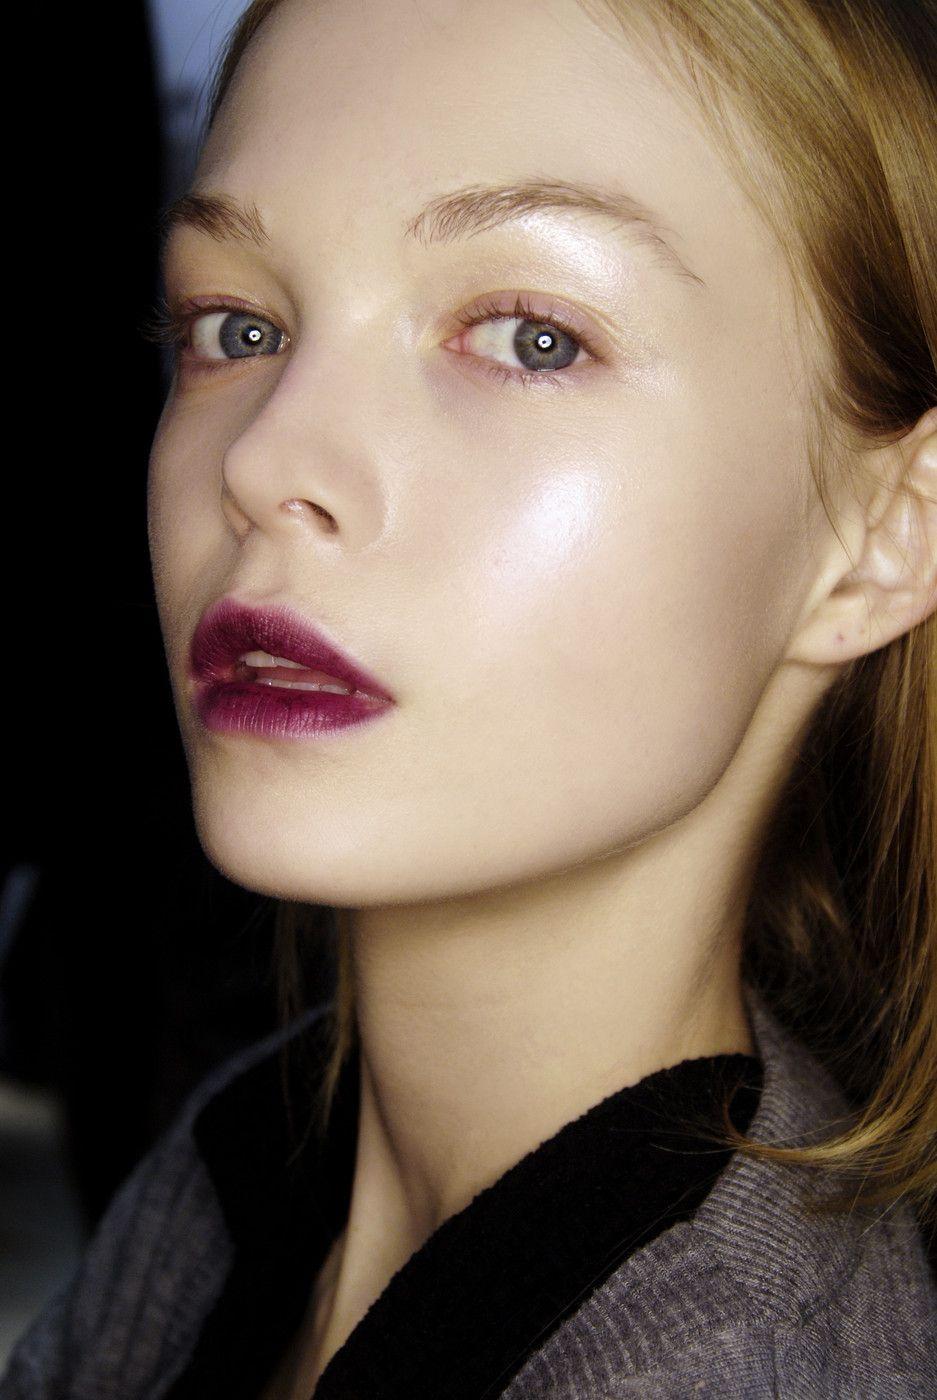 deep purple lip stain